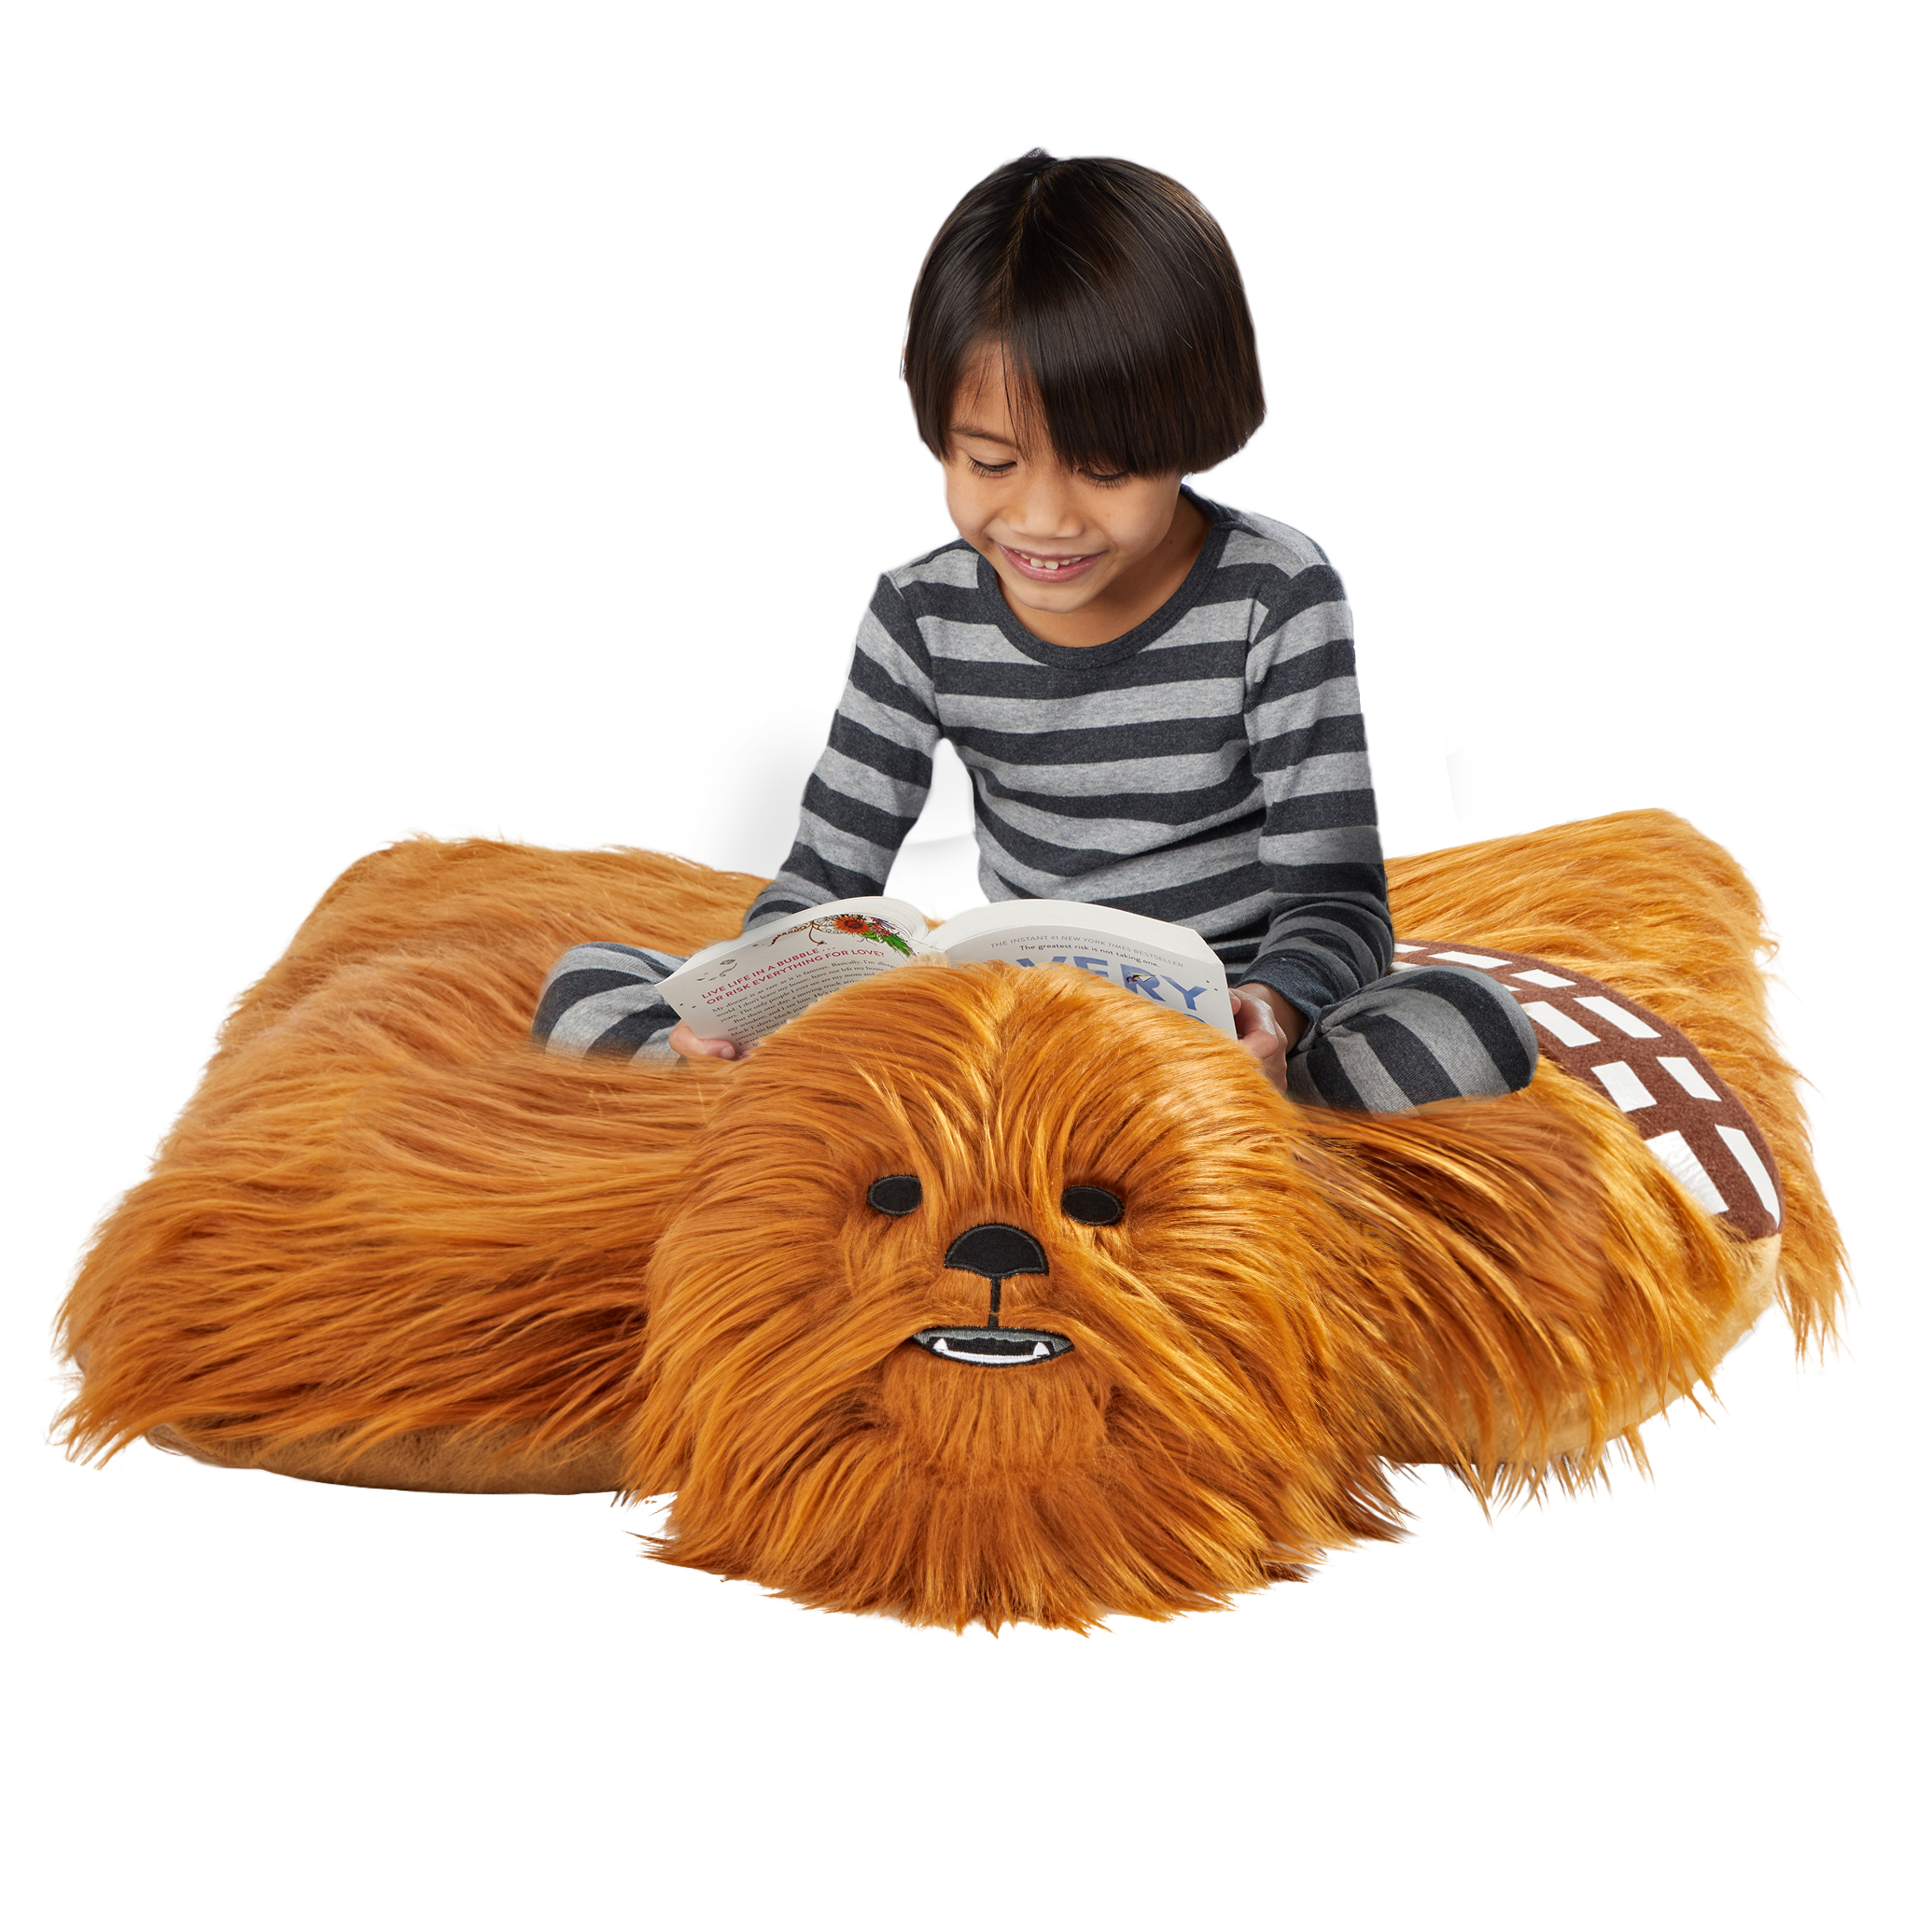 my pillow pets star wars chewbacca 16